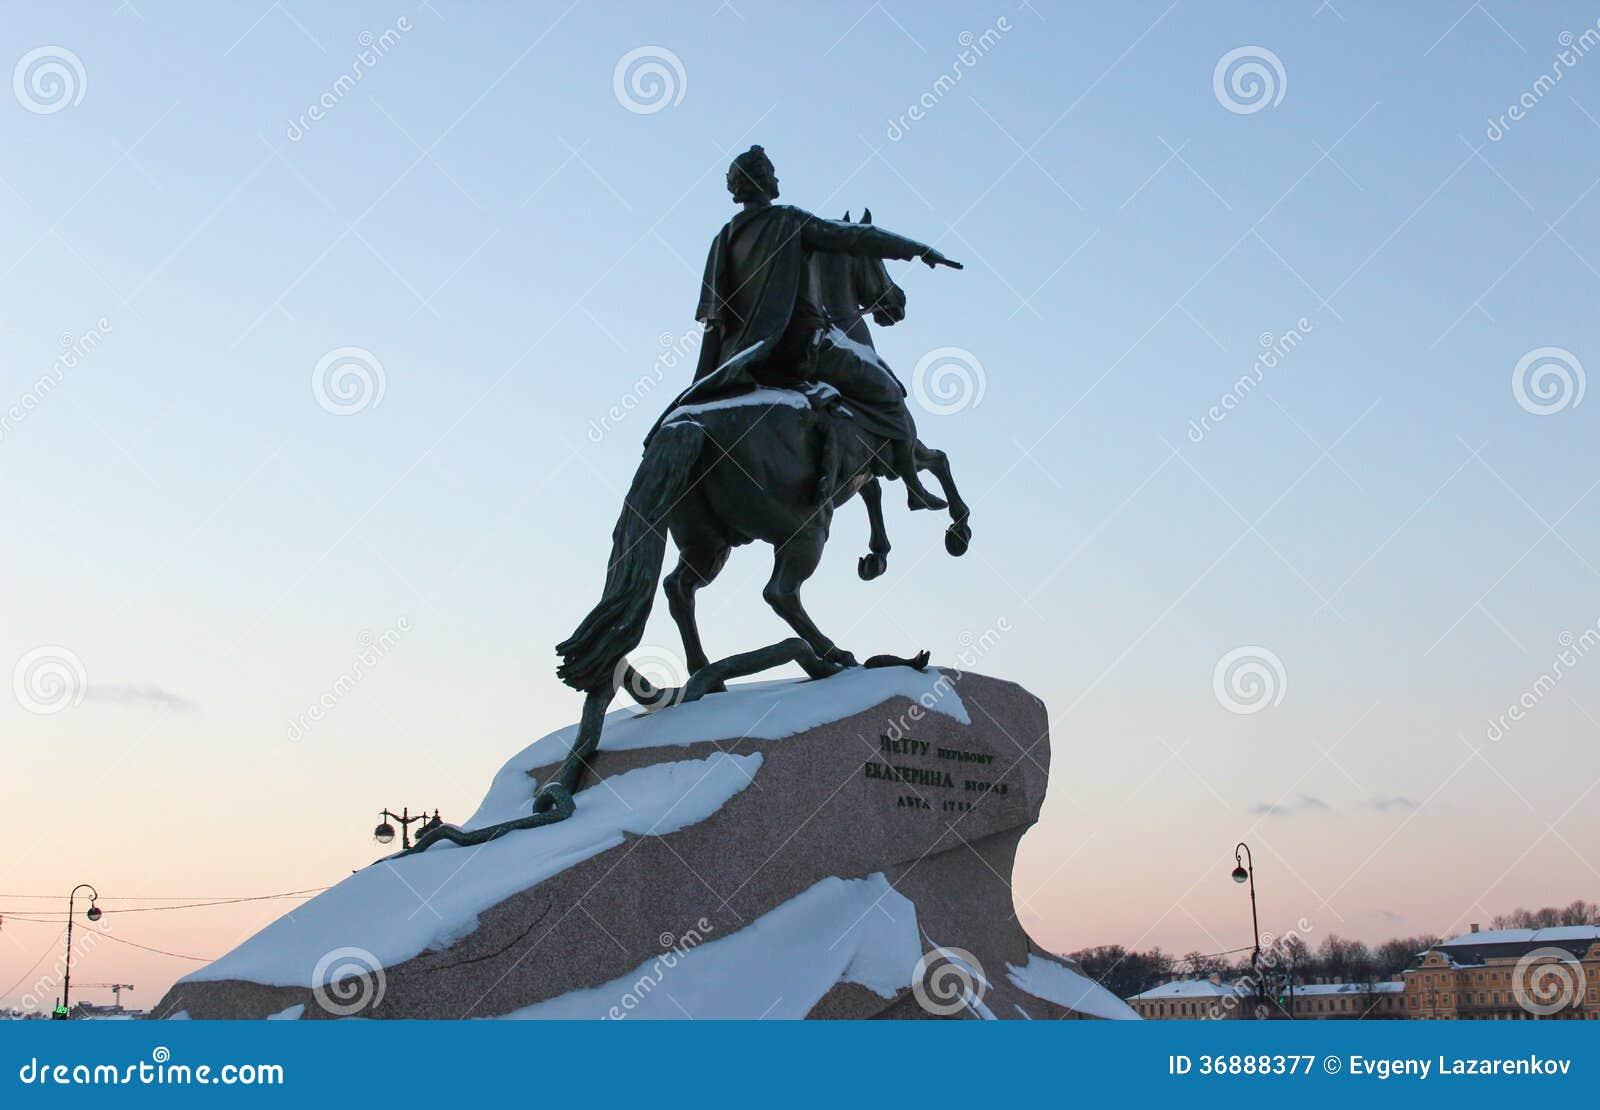 Bronsruiter, Monument aan Petere eerst, heilige-Petersburg